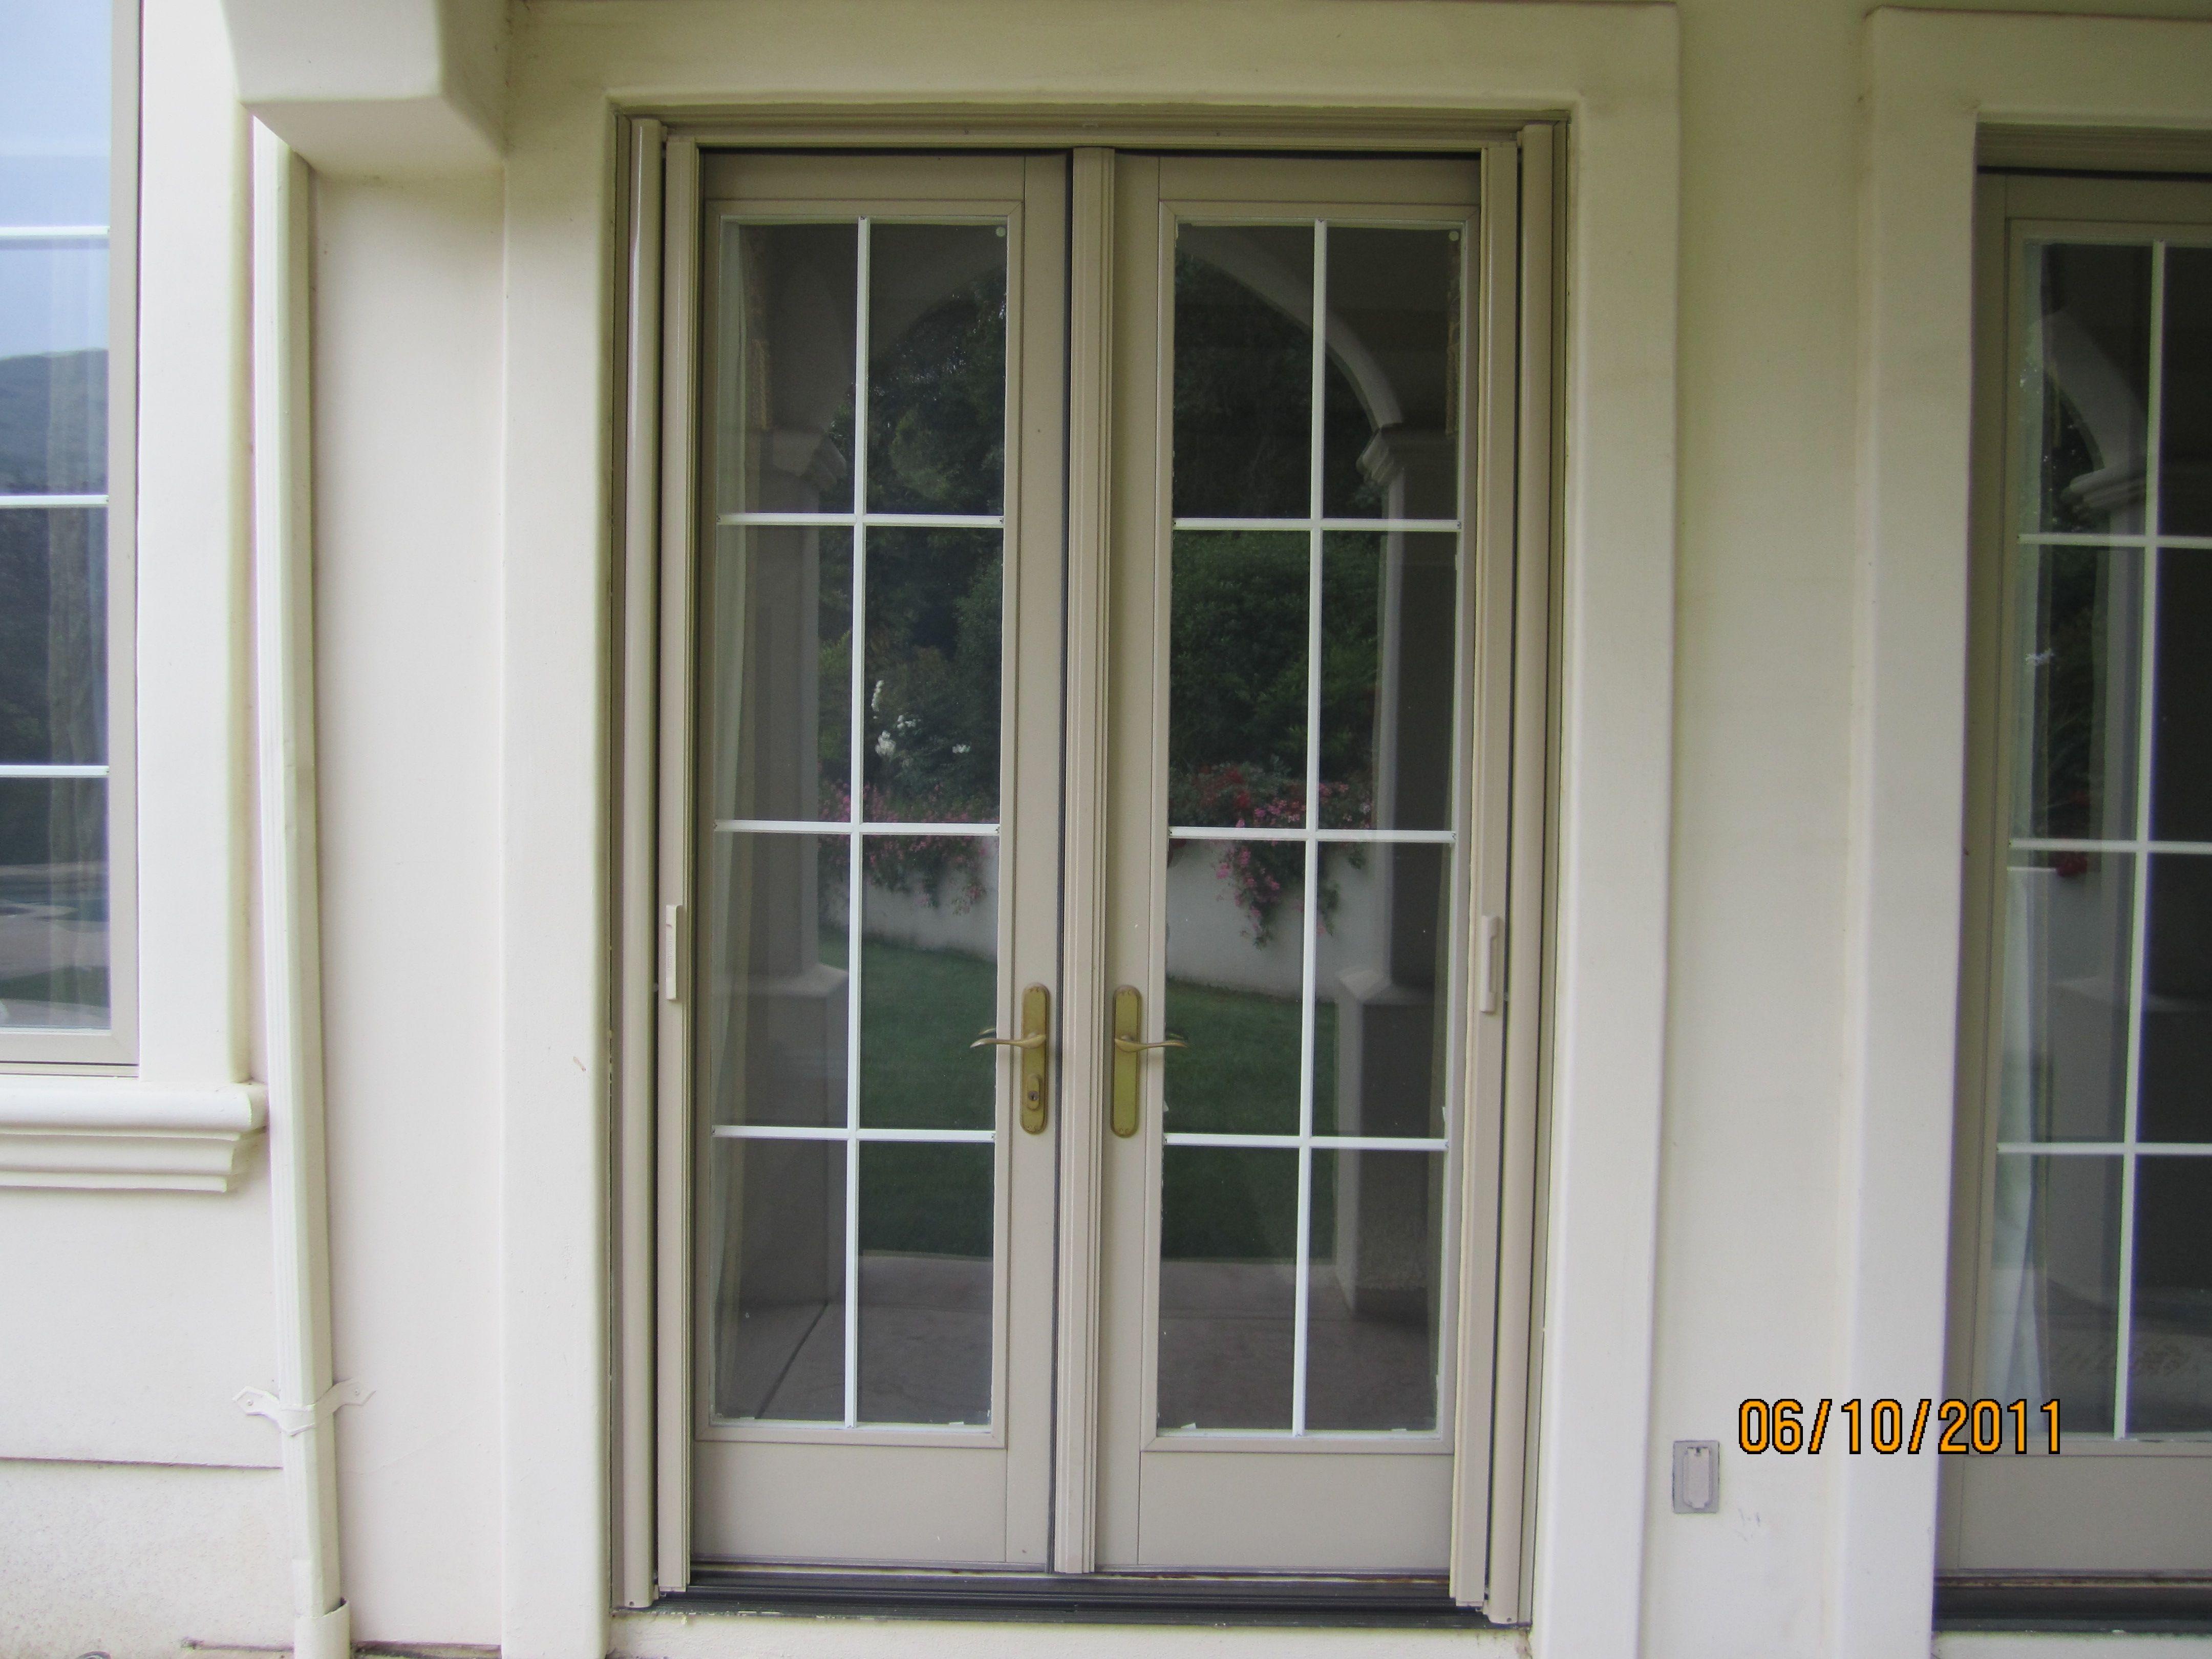 Outward Opening Exterior French Doors Httpthefallguyediting